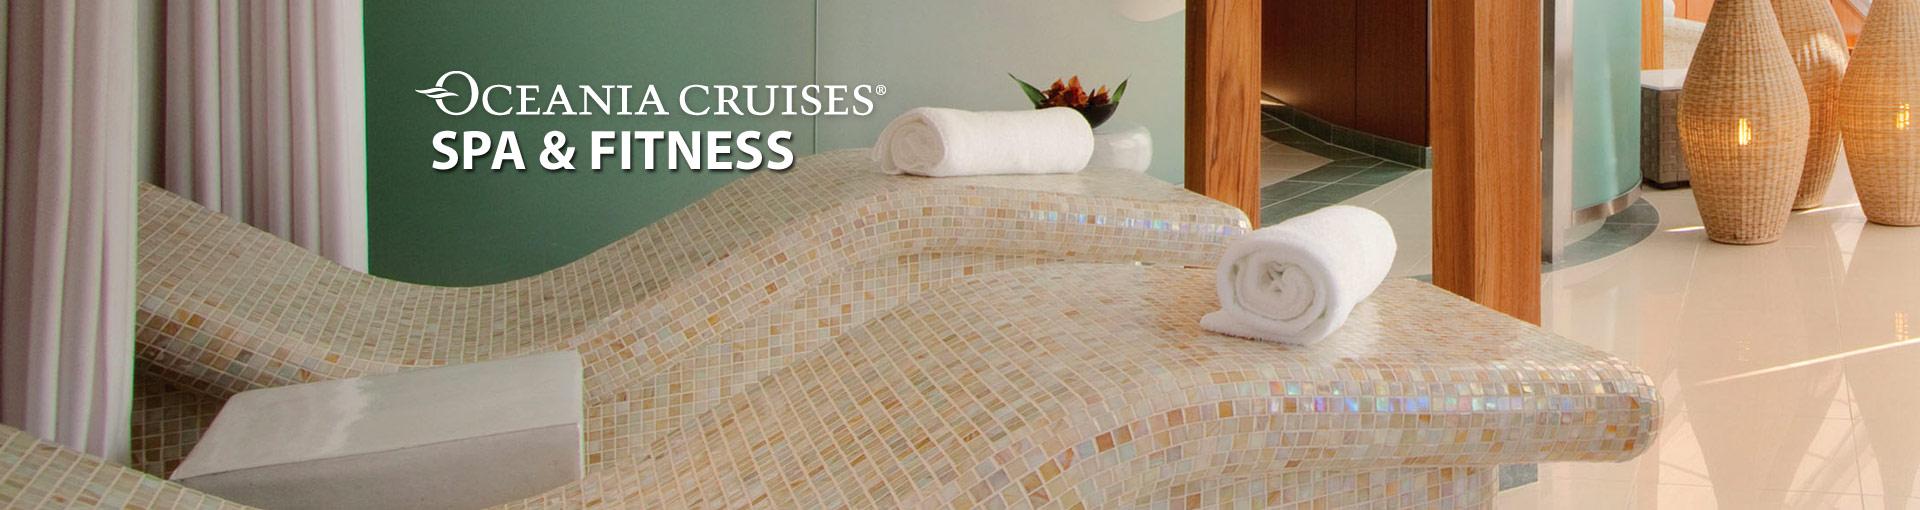 Oceania Cruises Spa & Fitness